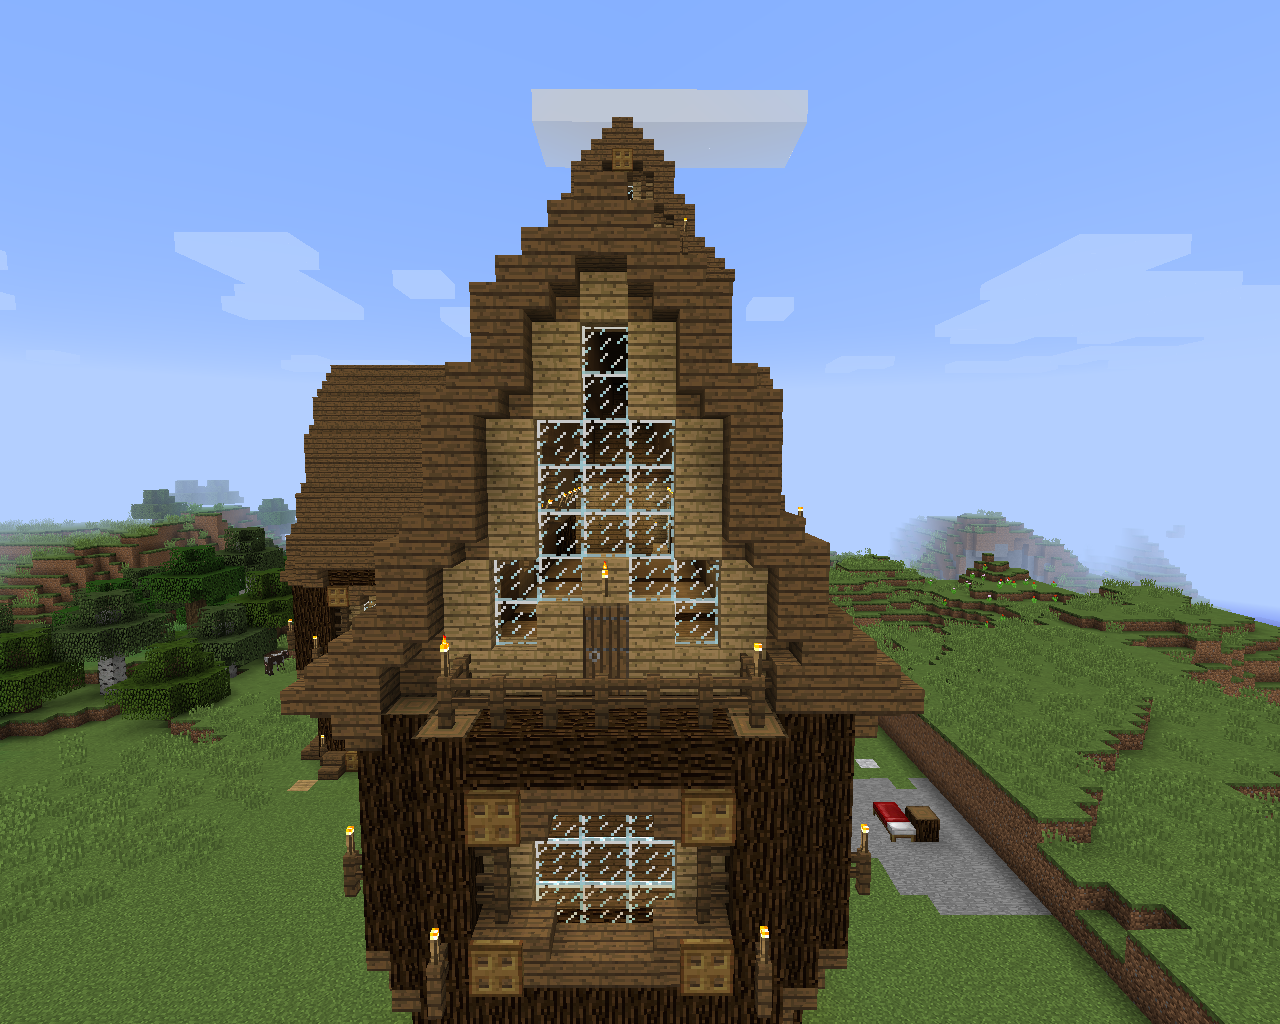 Minecraftの画像 p1_12